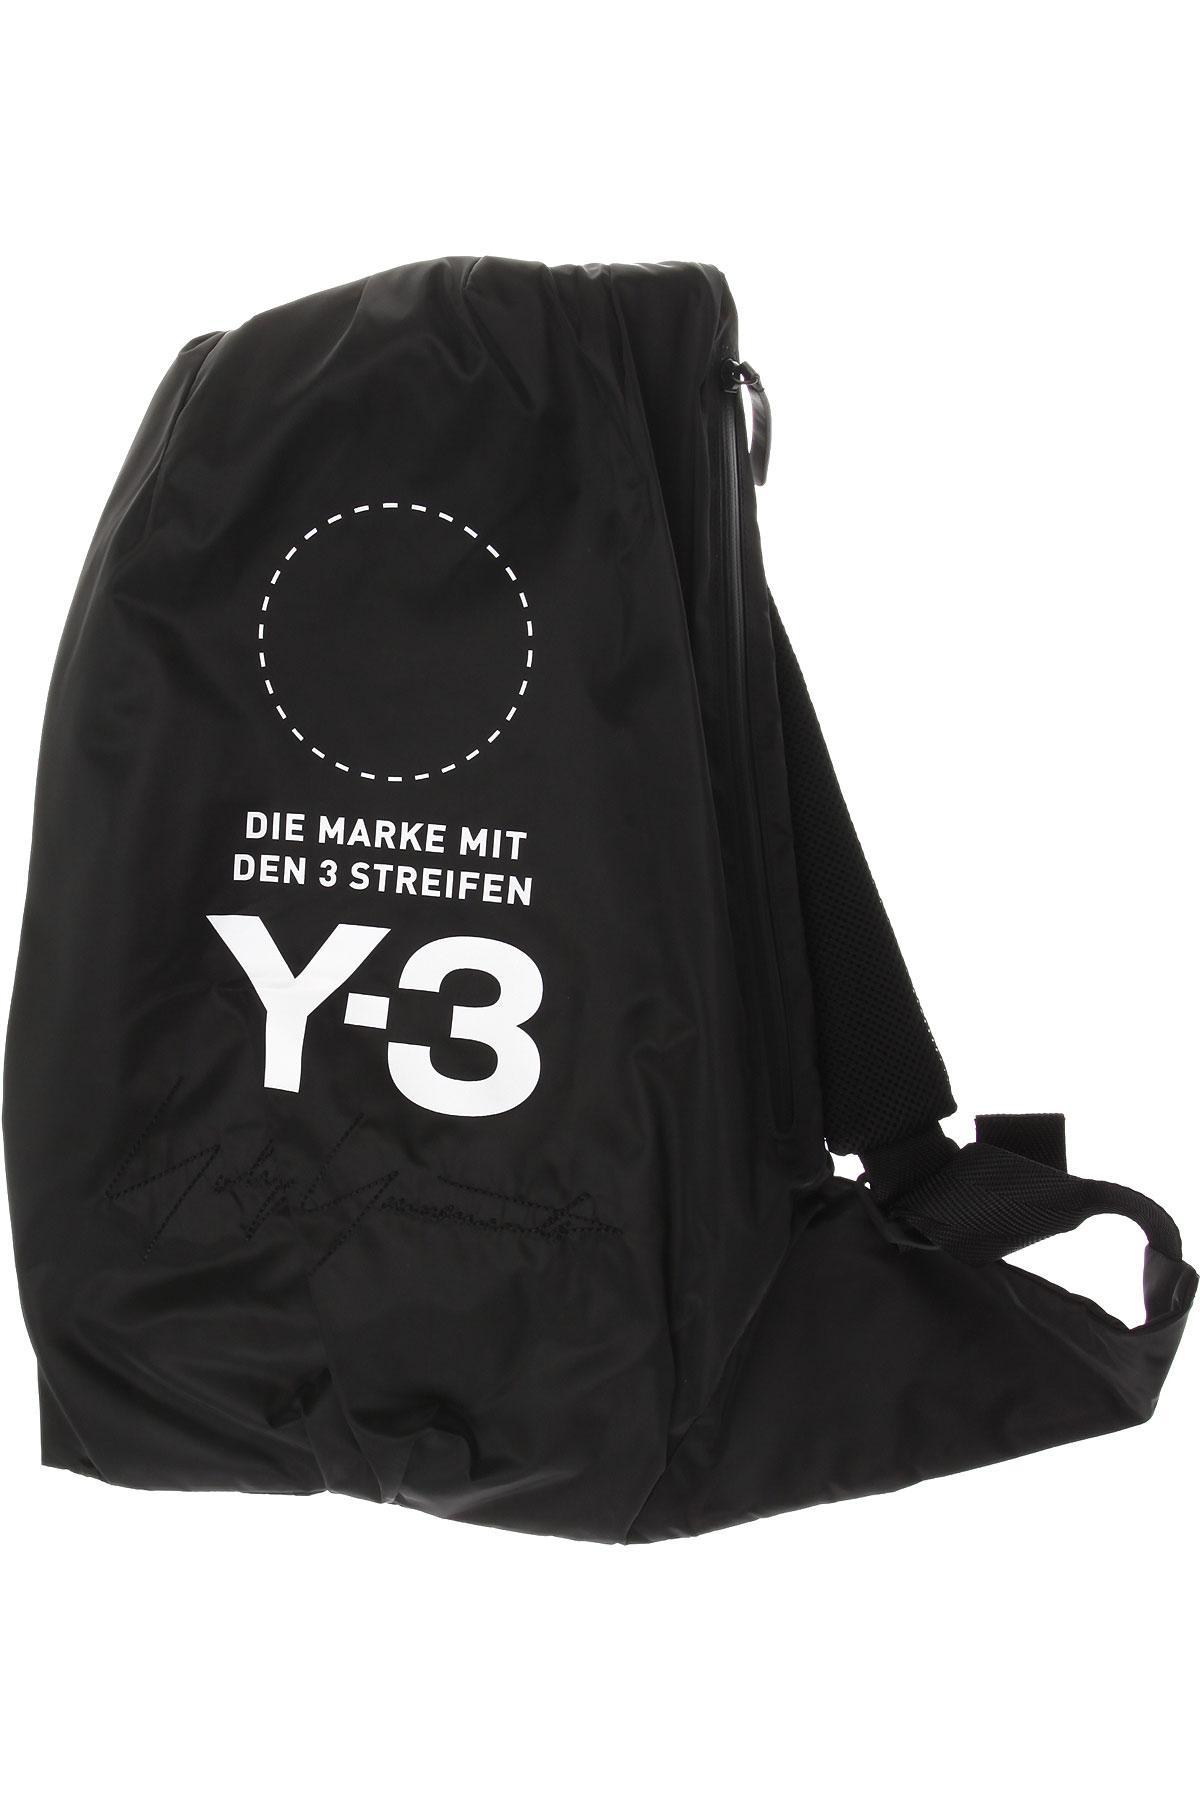 Y3 by Yohji Yamamoto Sac à Dos Homme Pas cher en Soldes, Noir, Polyester, 2017